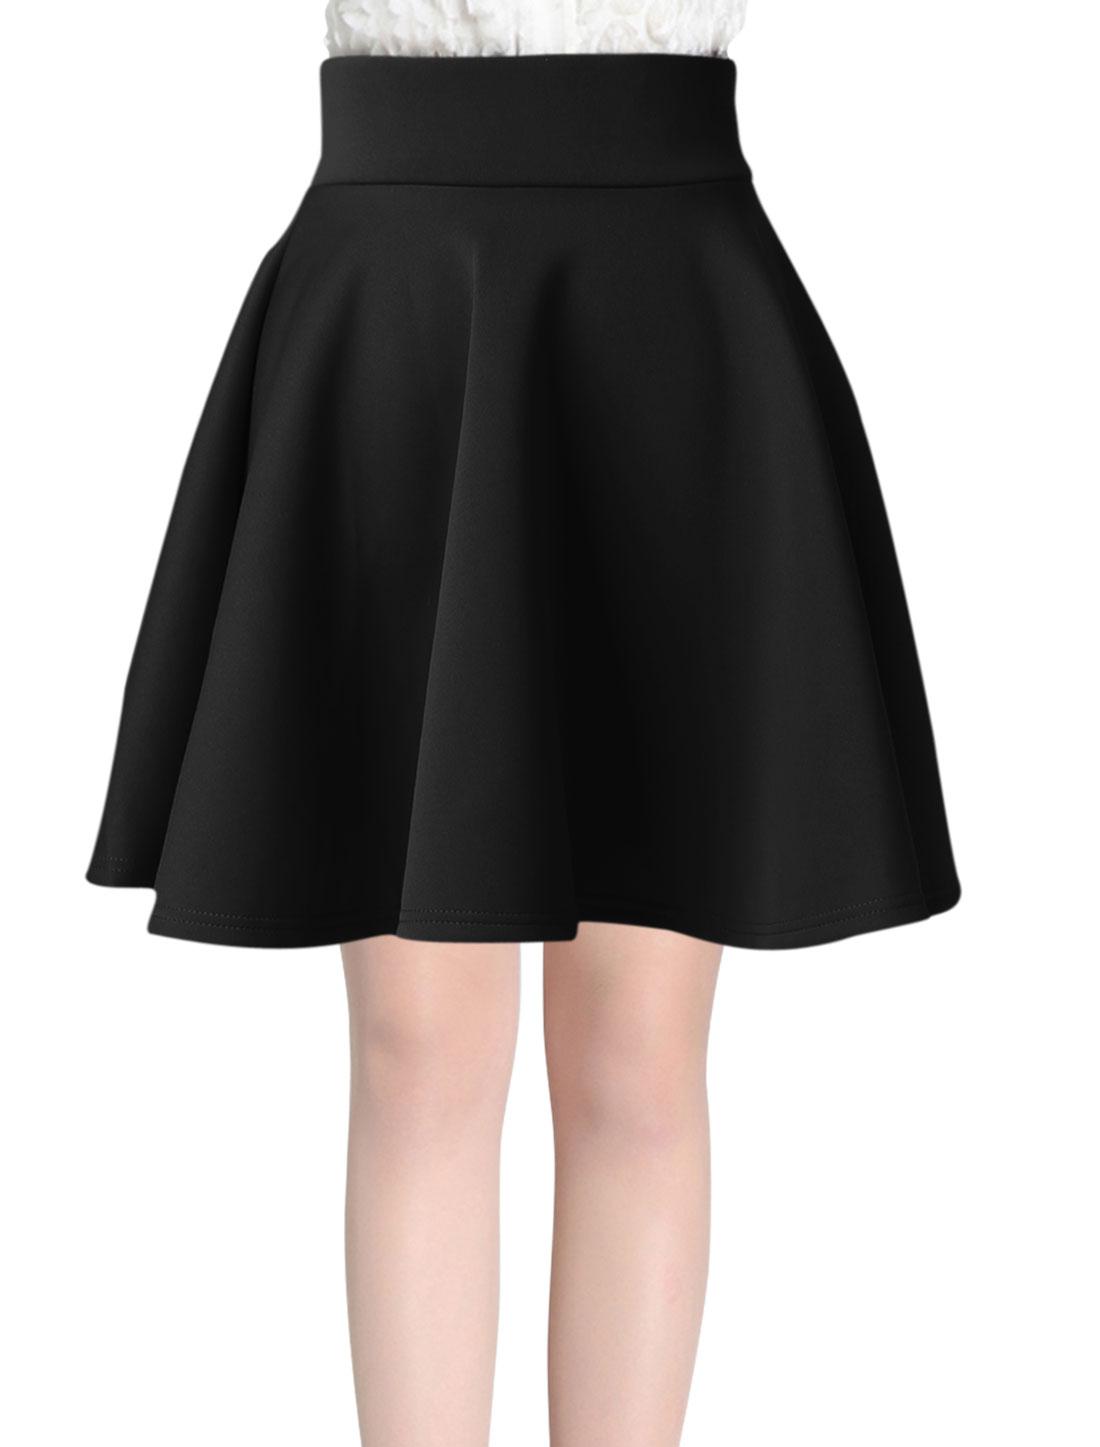 High Waist Ruffled New Style A-Line Skirt for Women Black XS